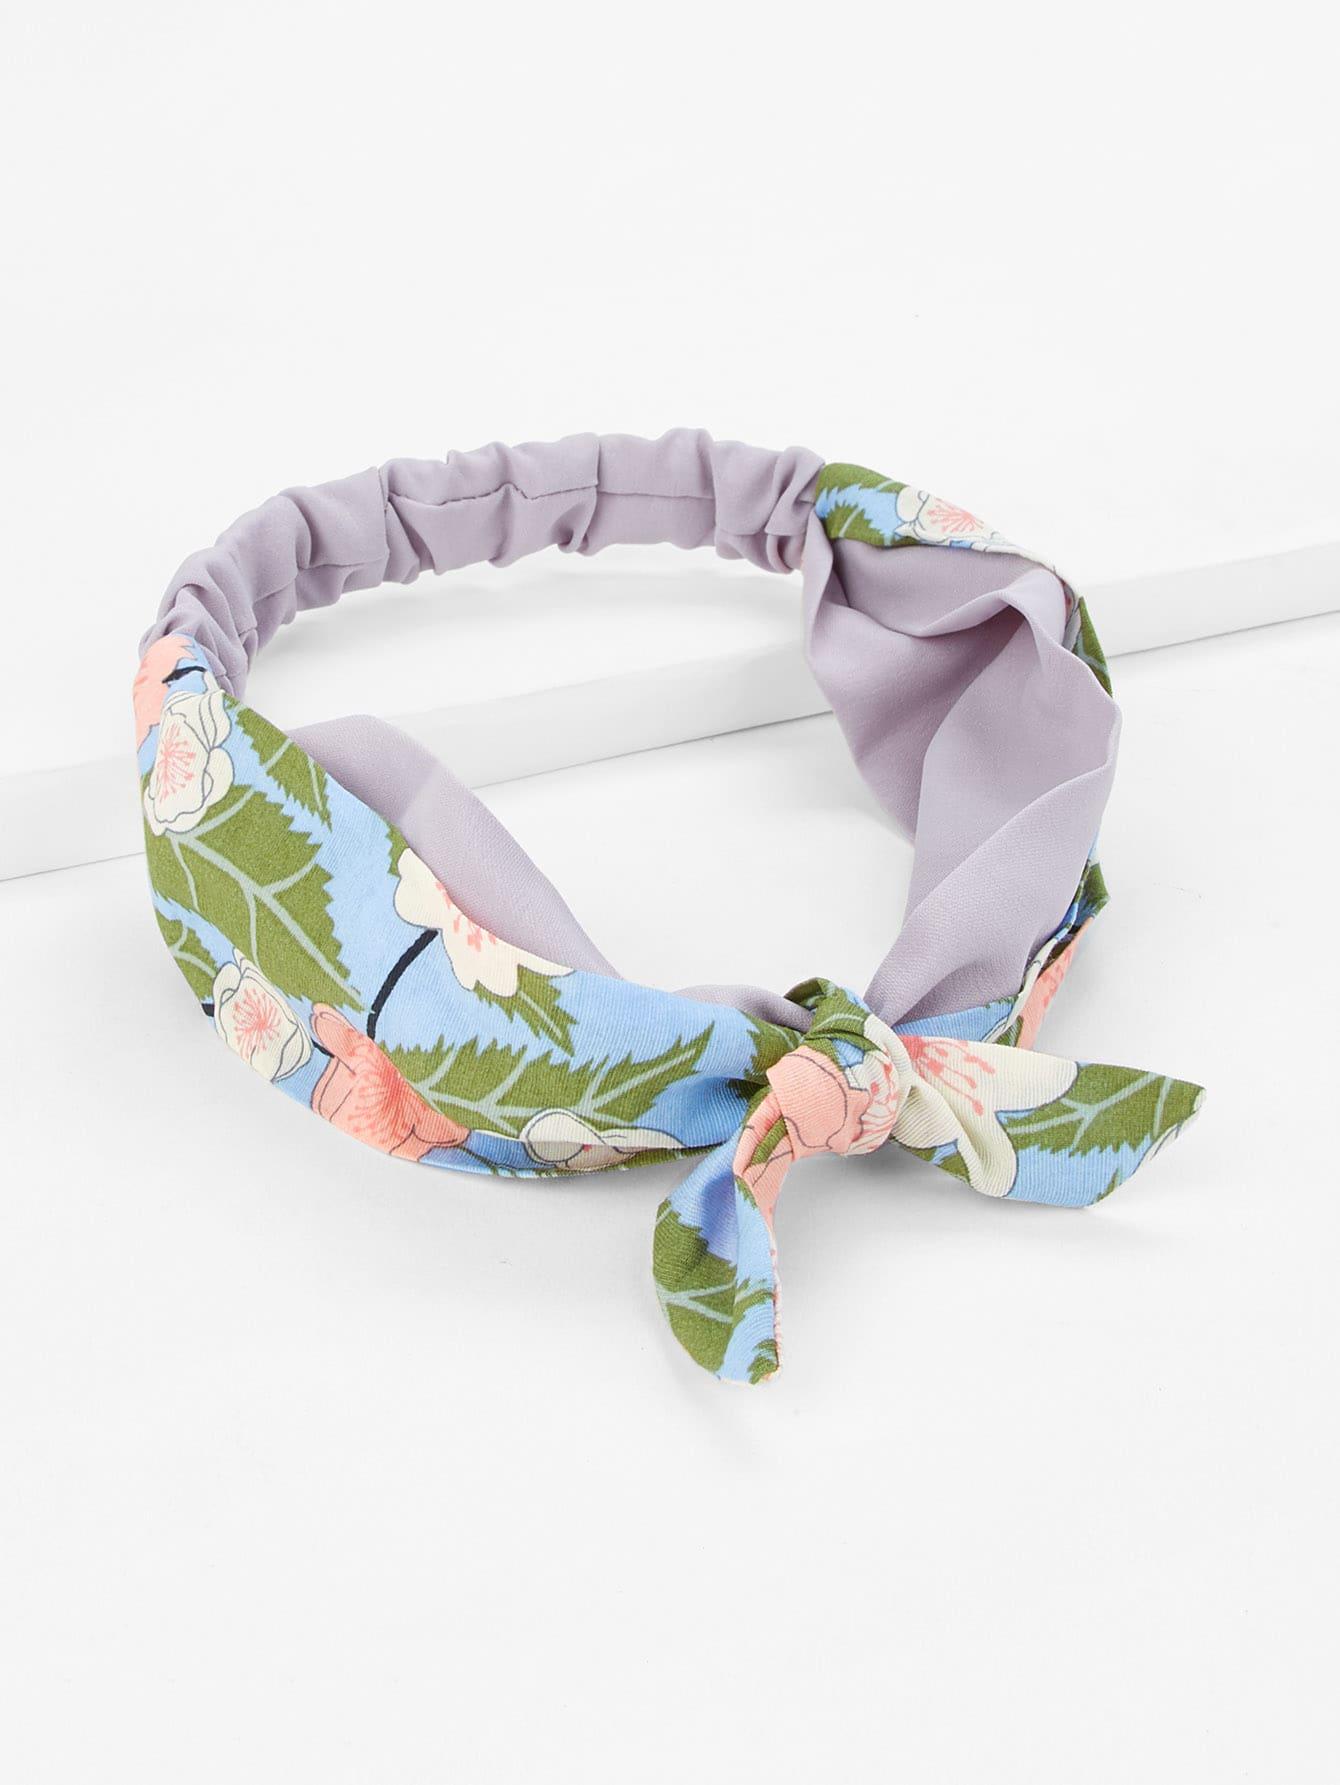 Flower Print Knot Headband mixed print headband